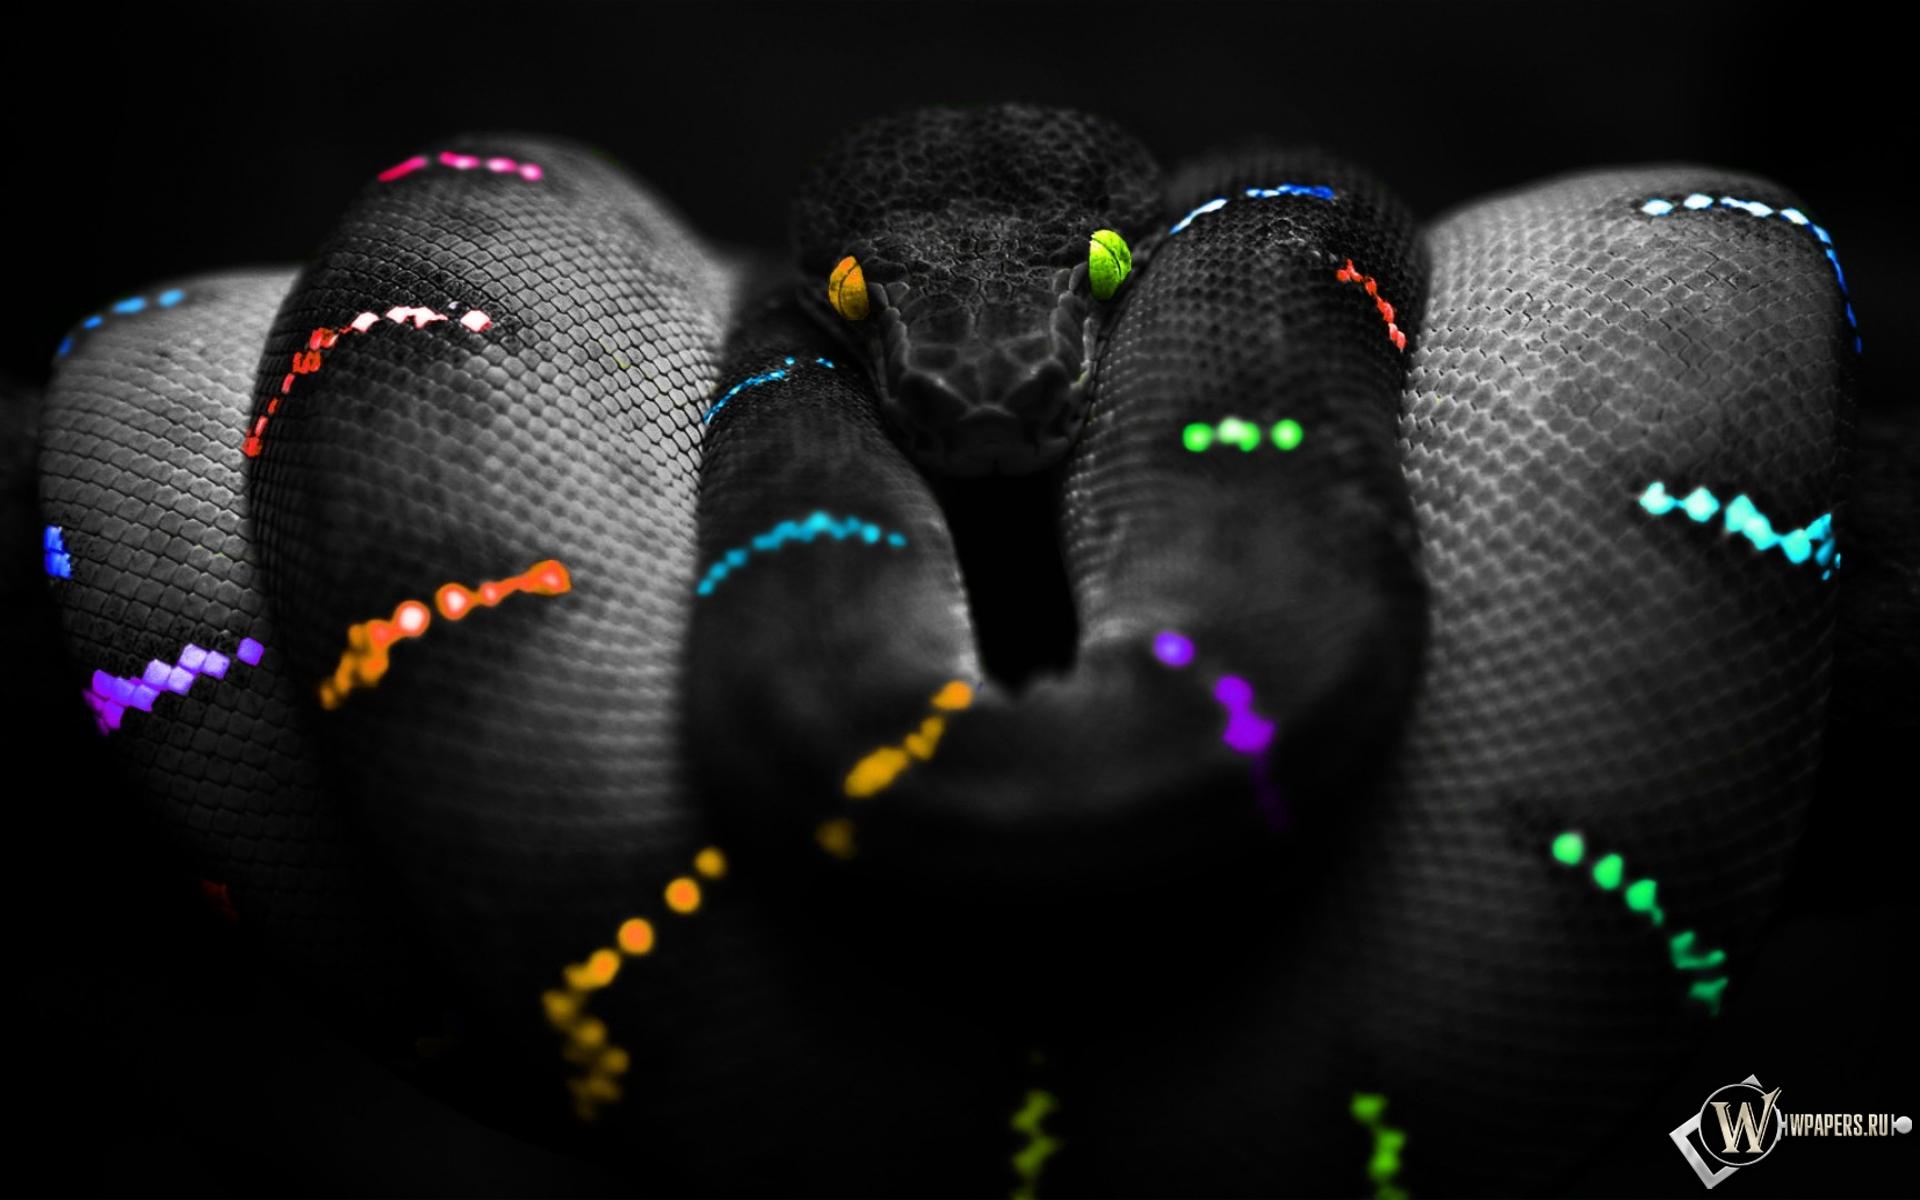 Цветная змея 1920x1200